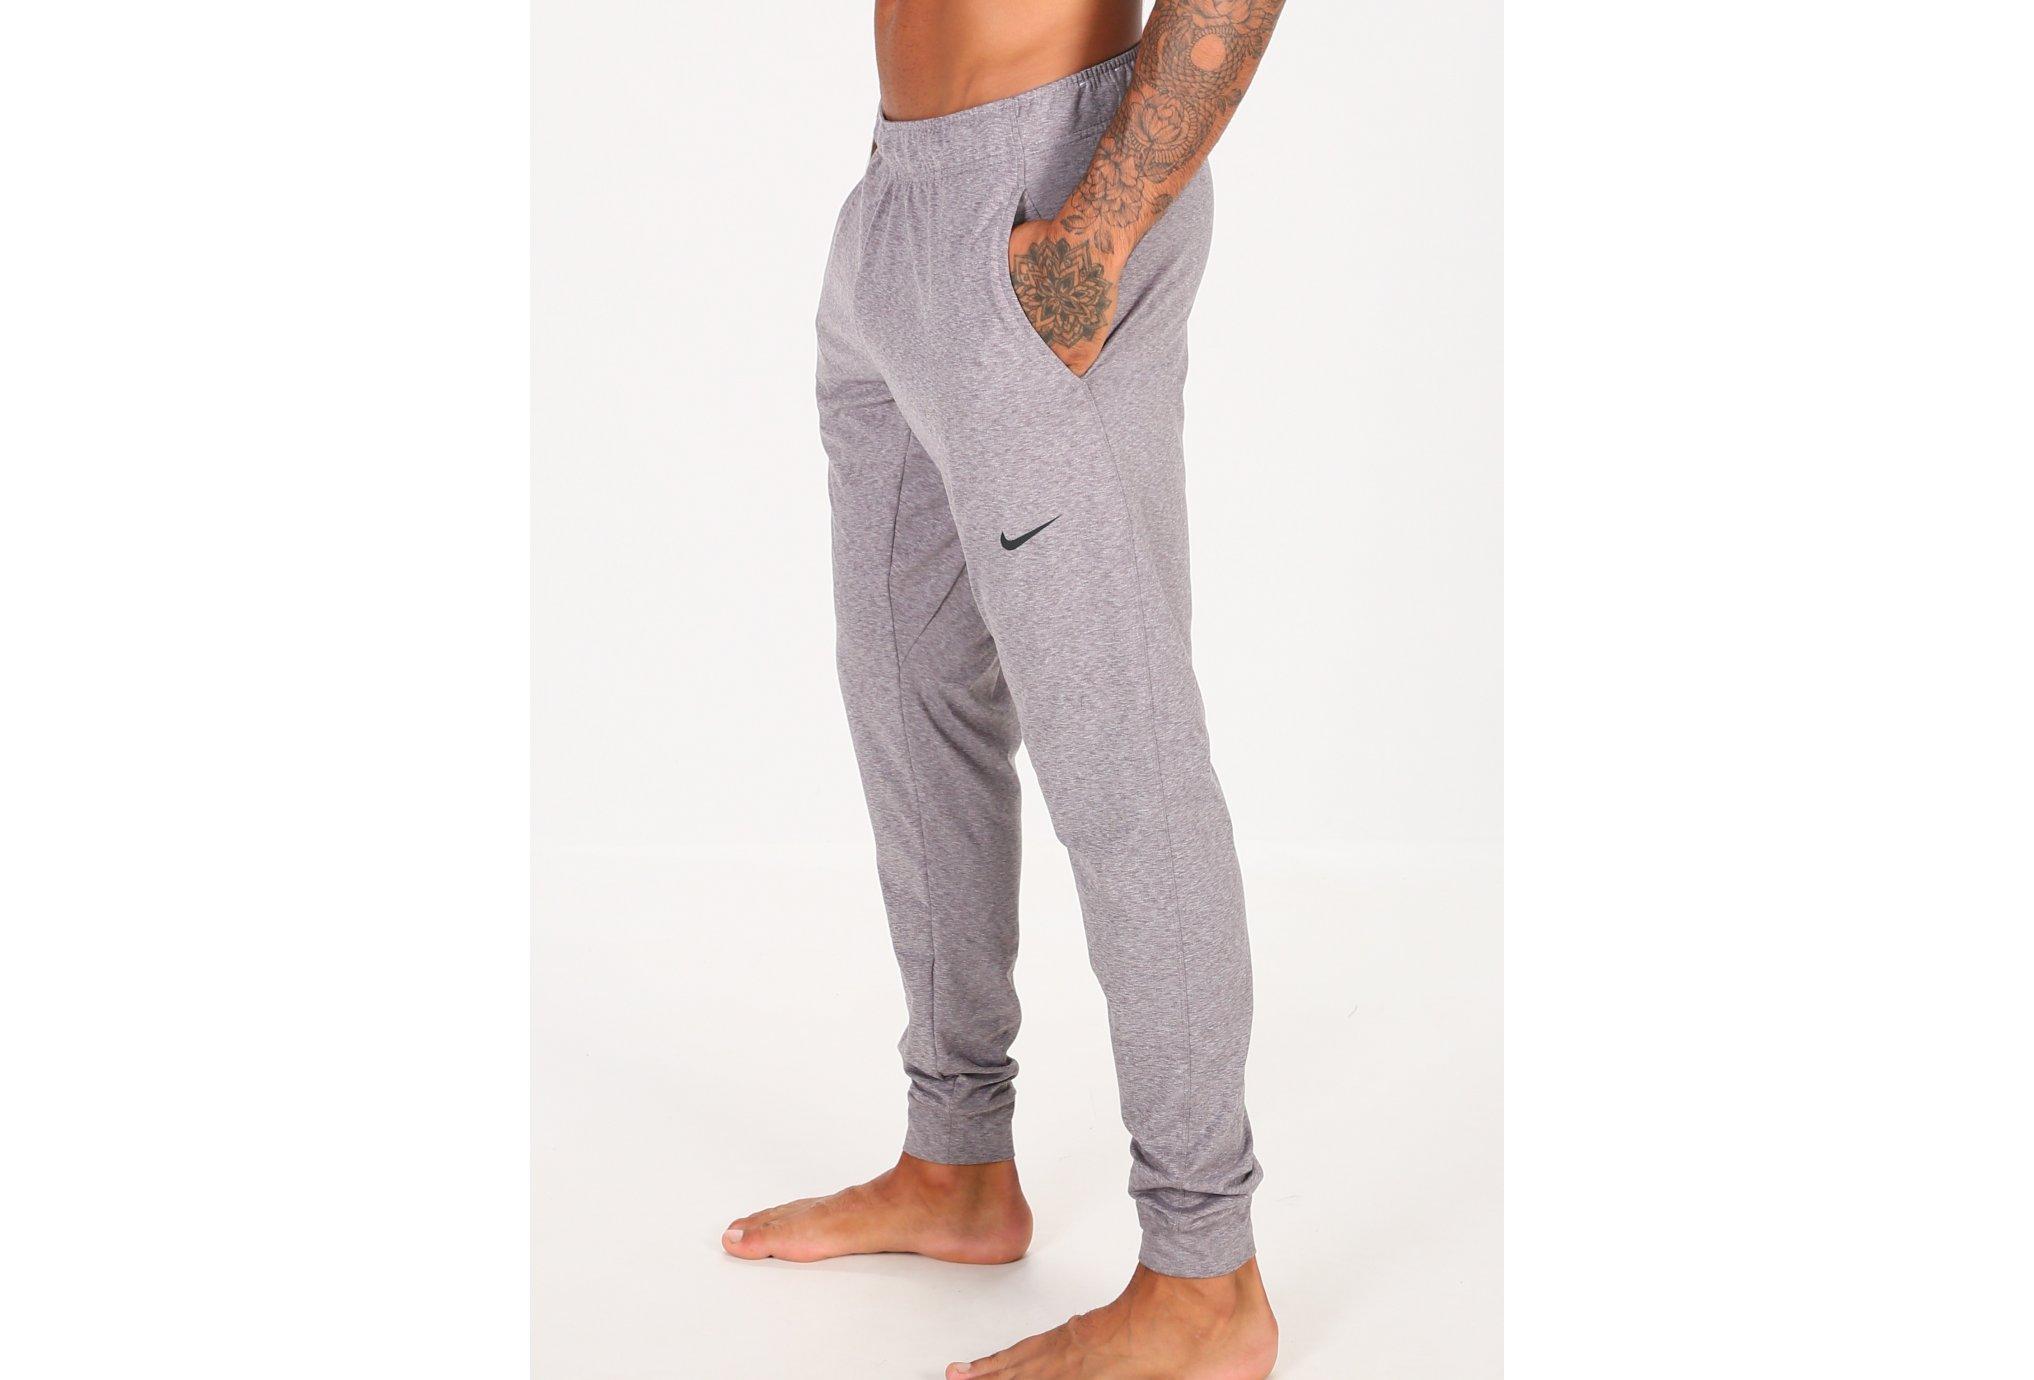 Nike Dry It M vêtement running homme